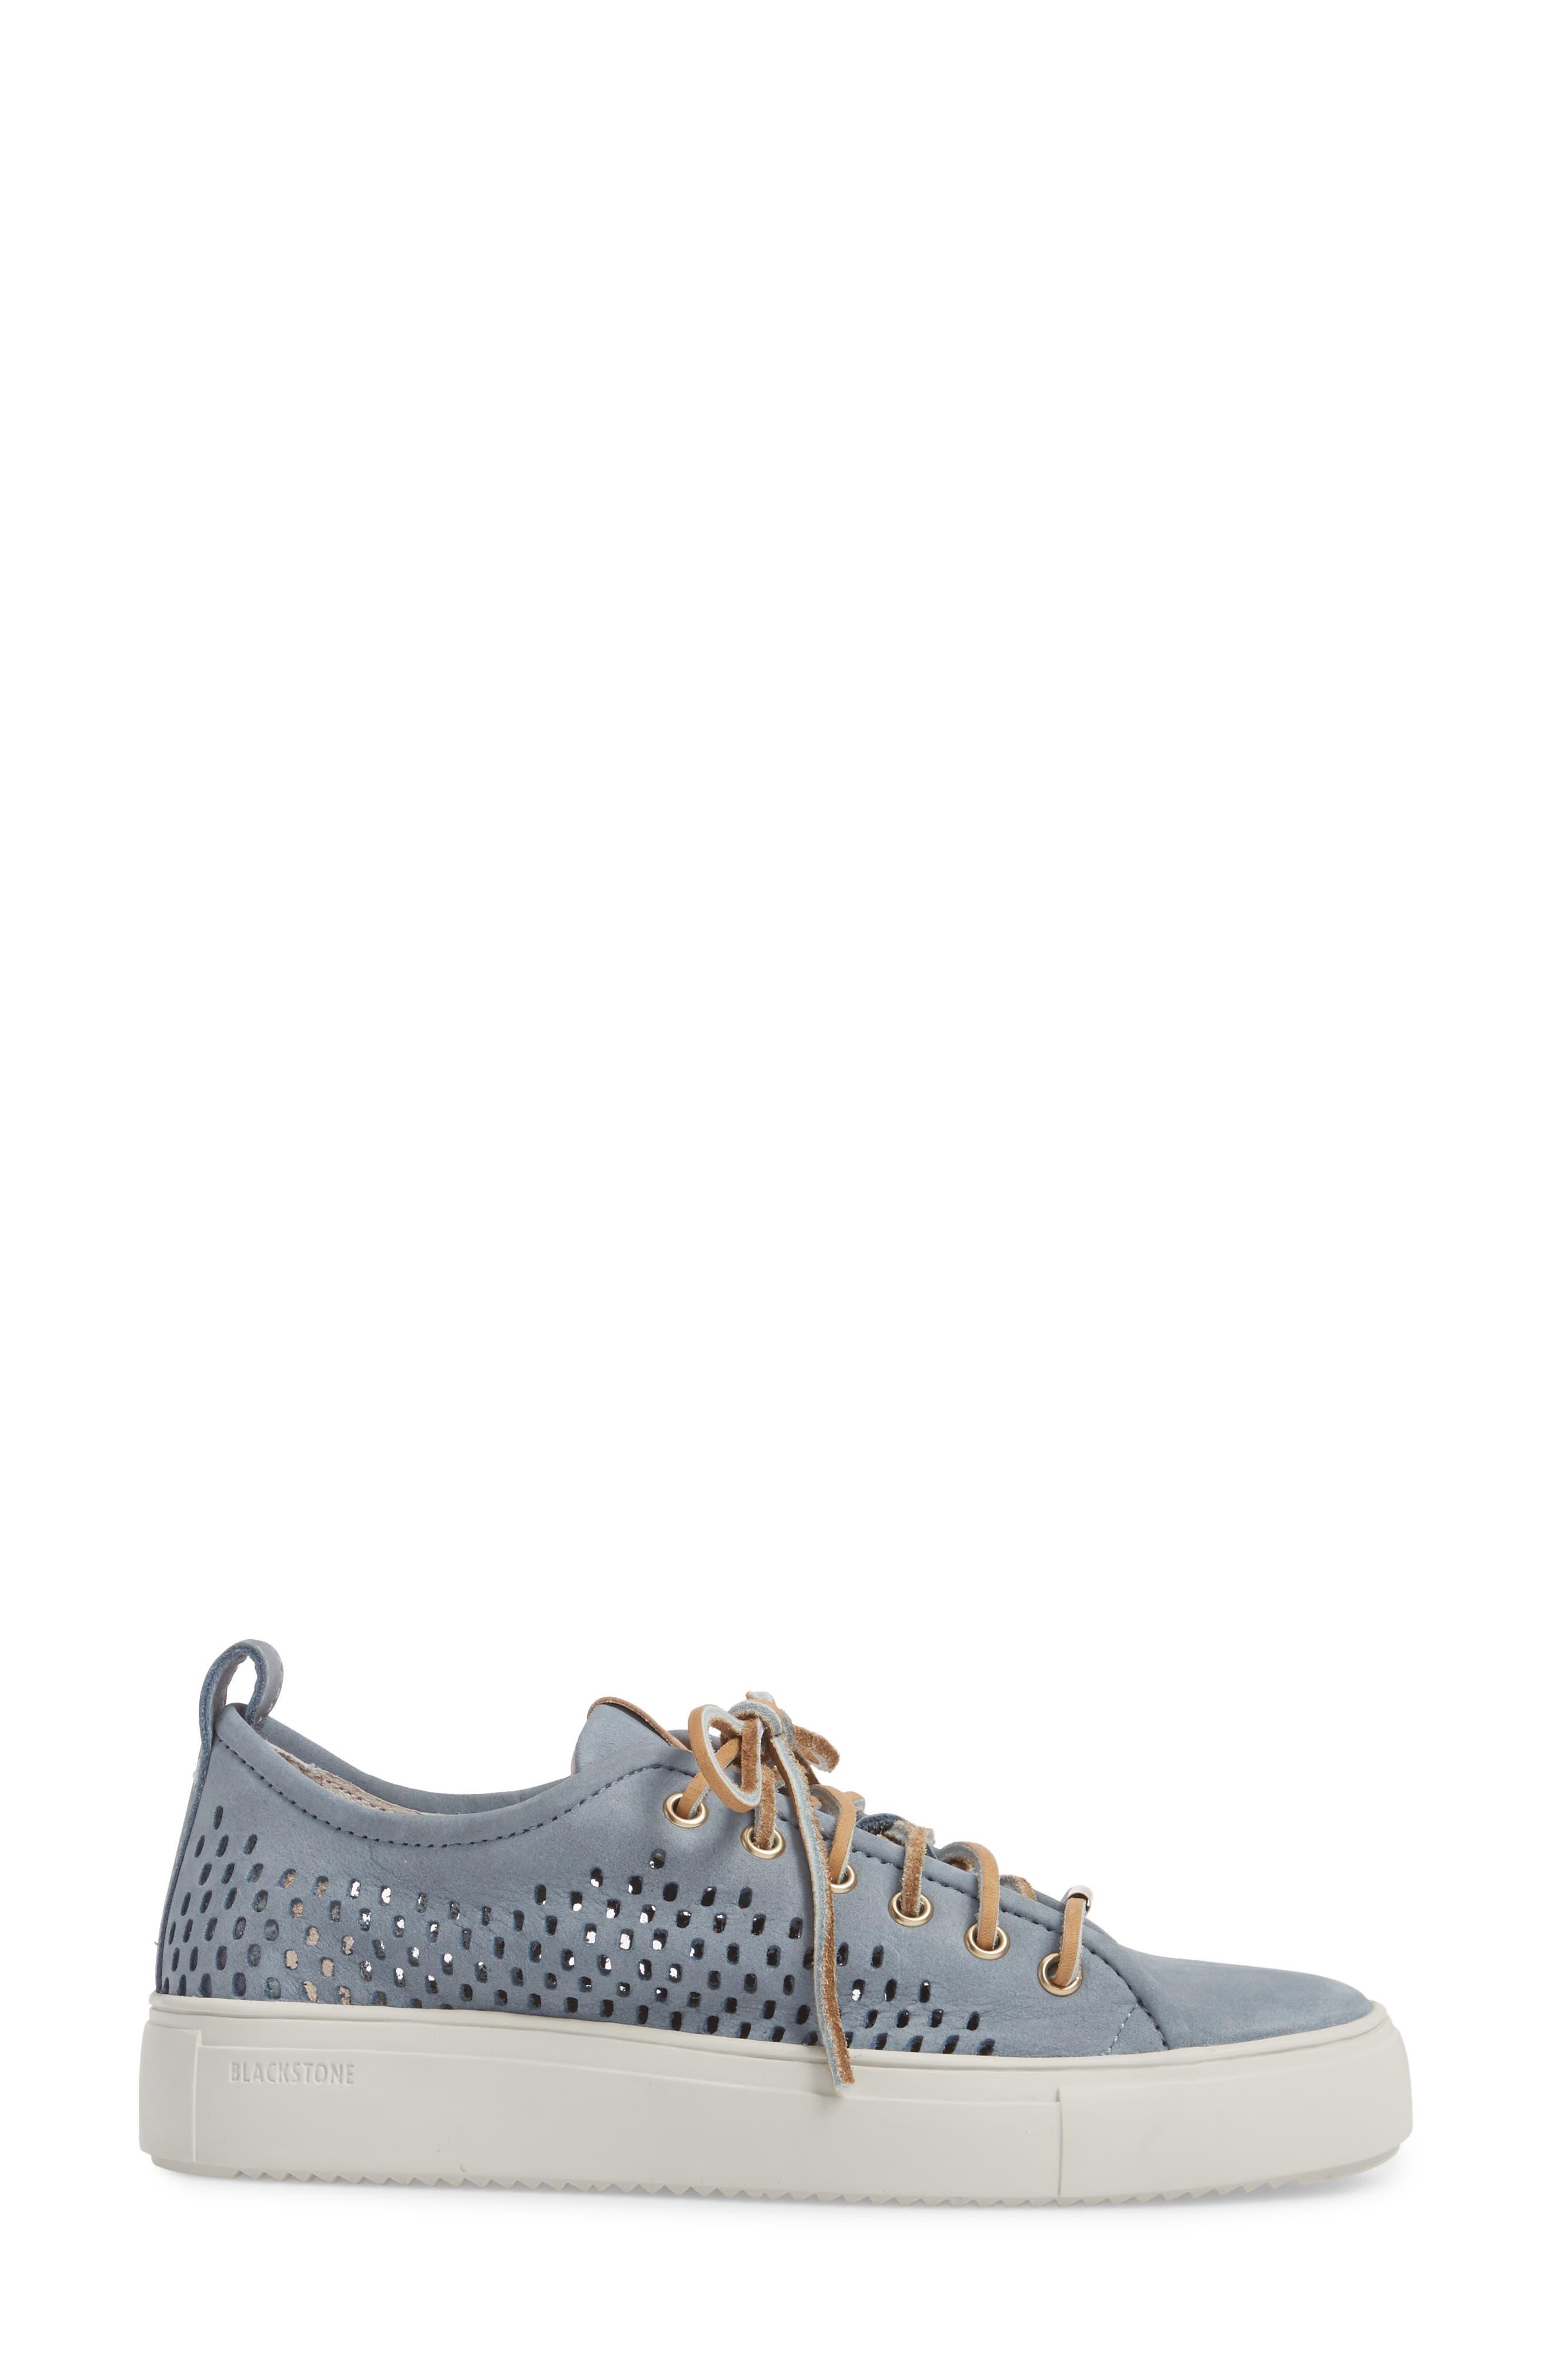 PL87 Sneaker,                             Alternate thumbnail 3, color,                             Winter Sky Leather